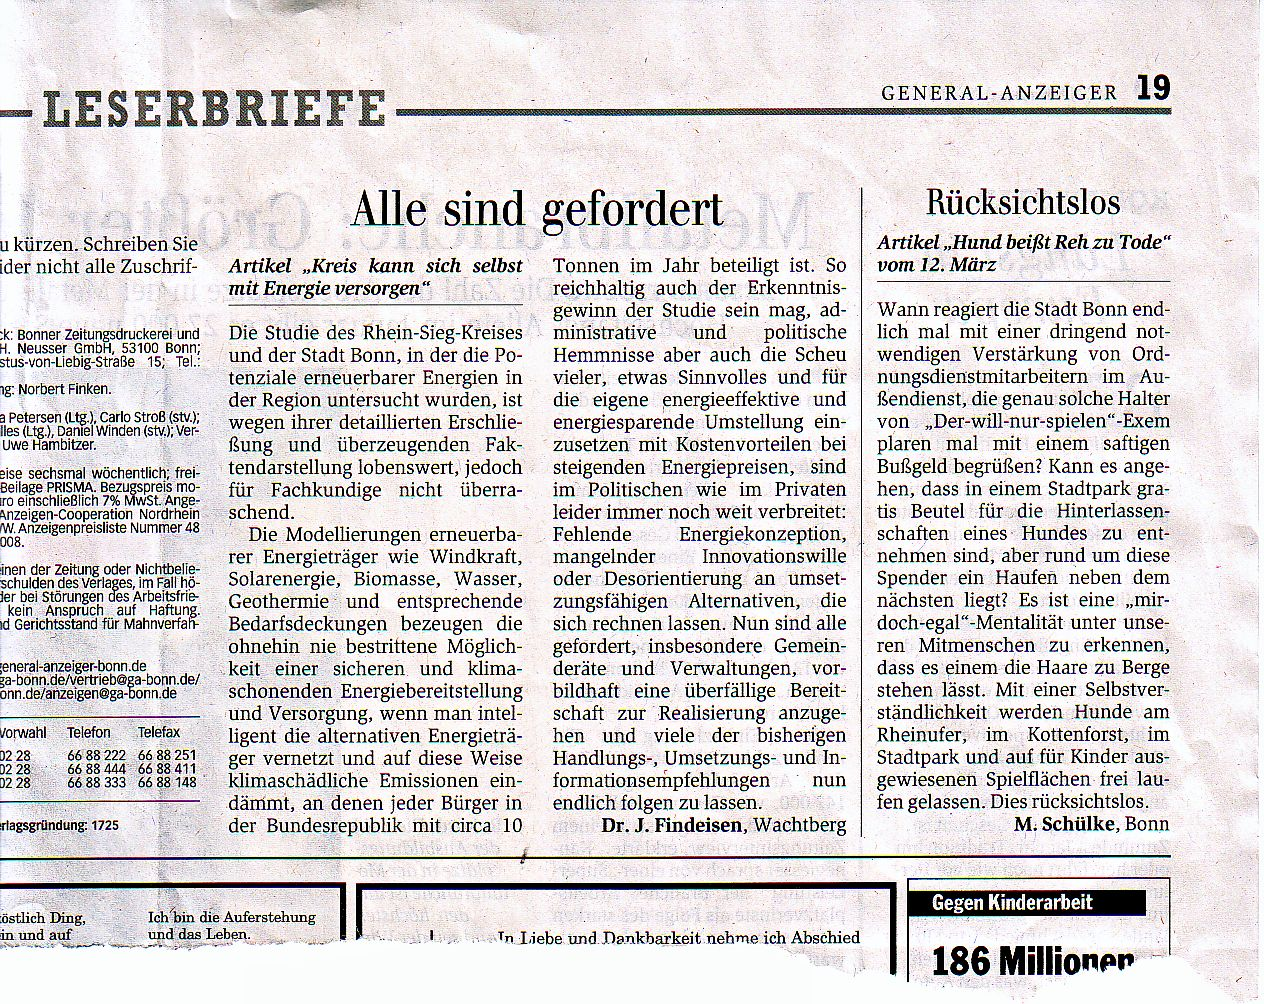 ing klaus ridder knigswinter berghausen leserbrief dr - Leserbriefe Beispiele